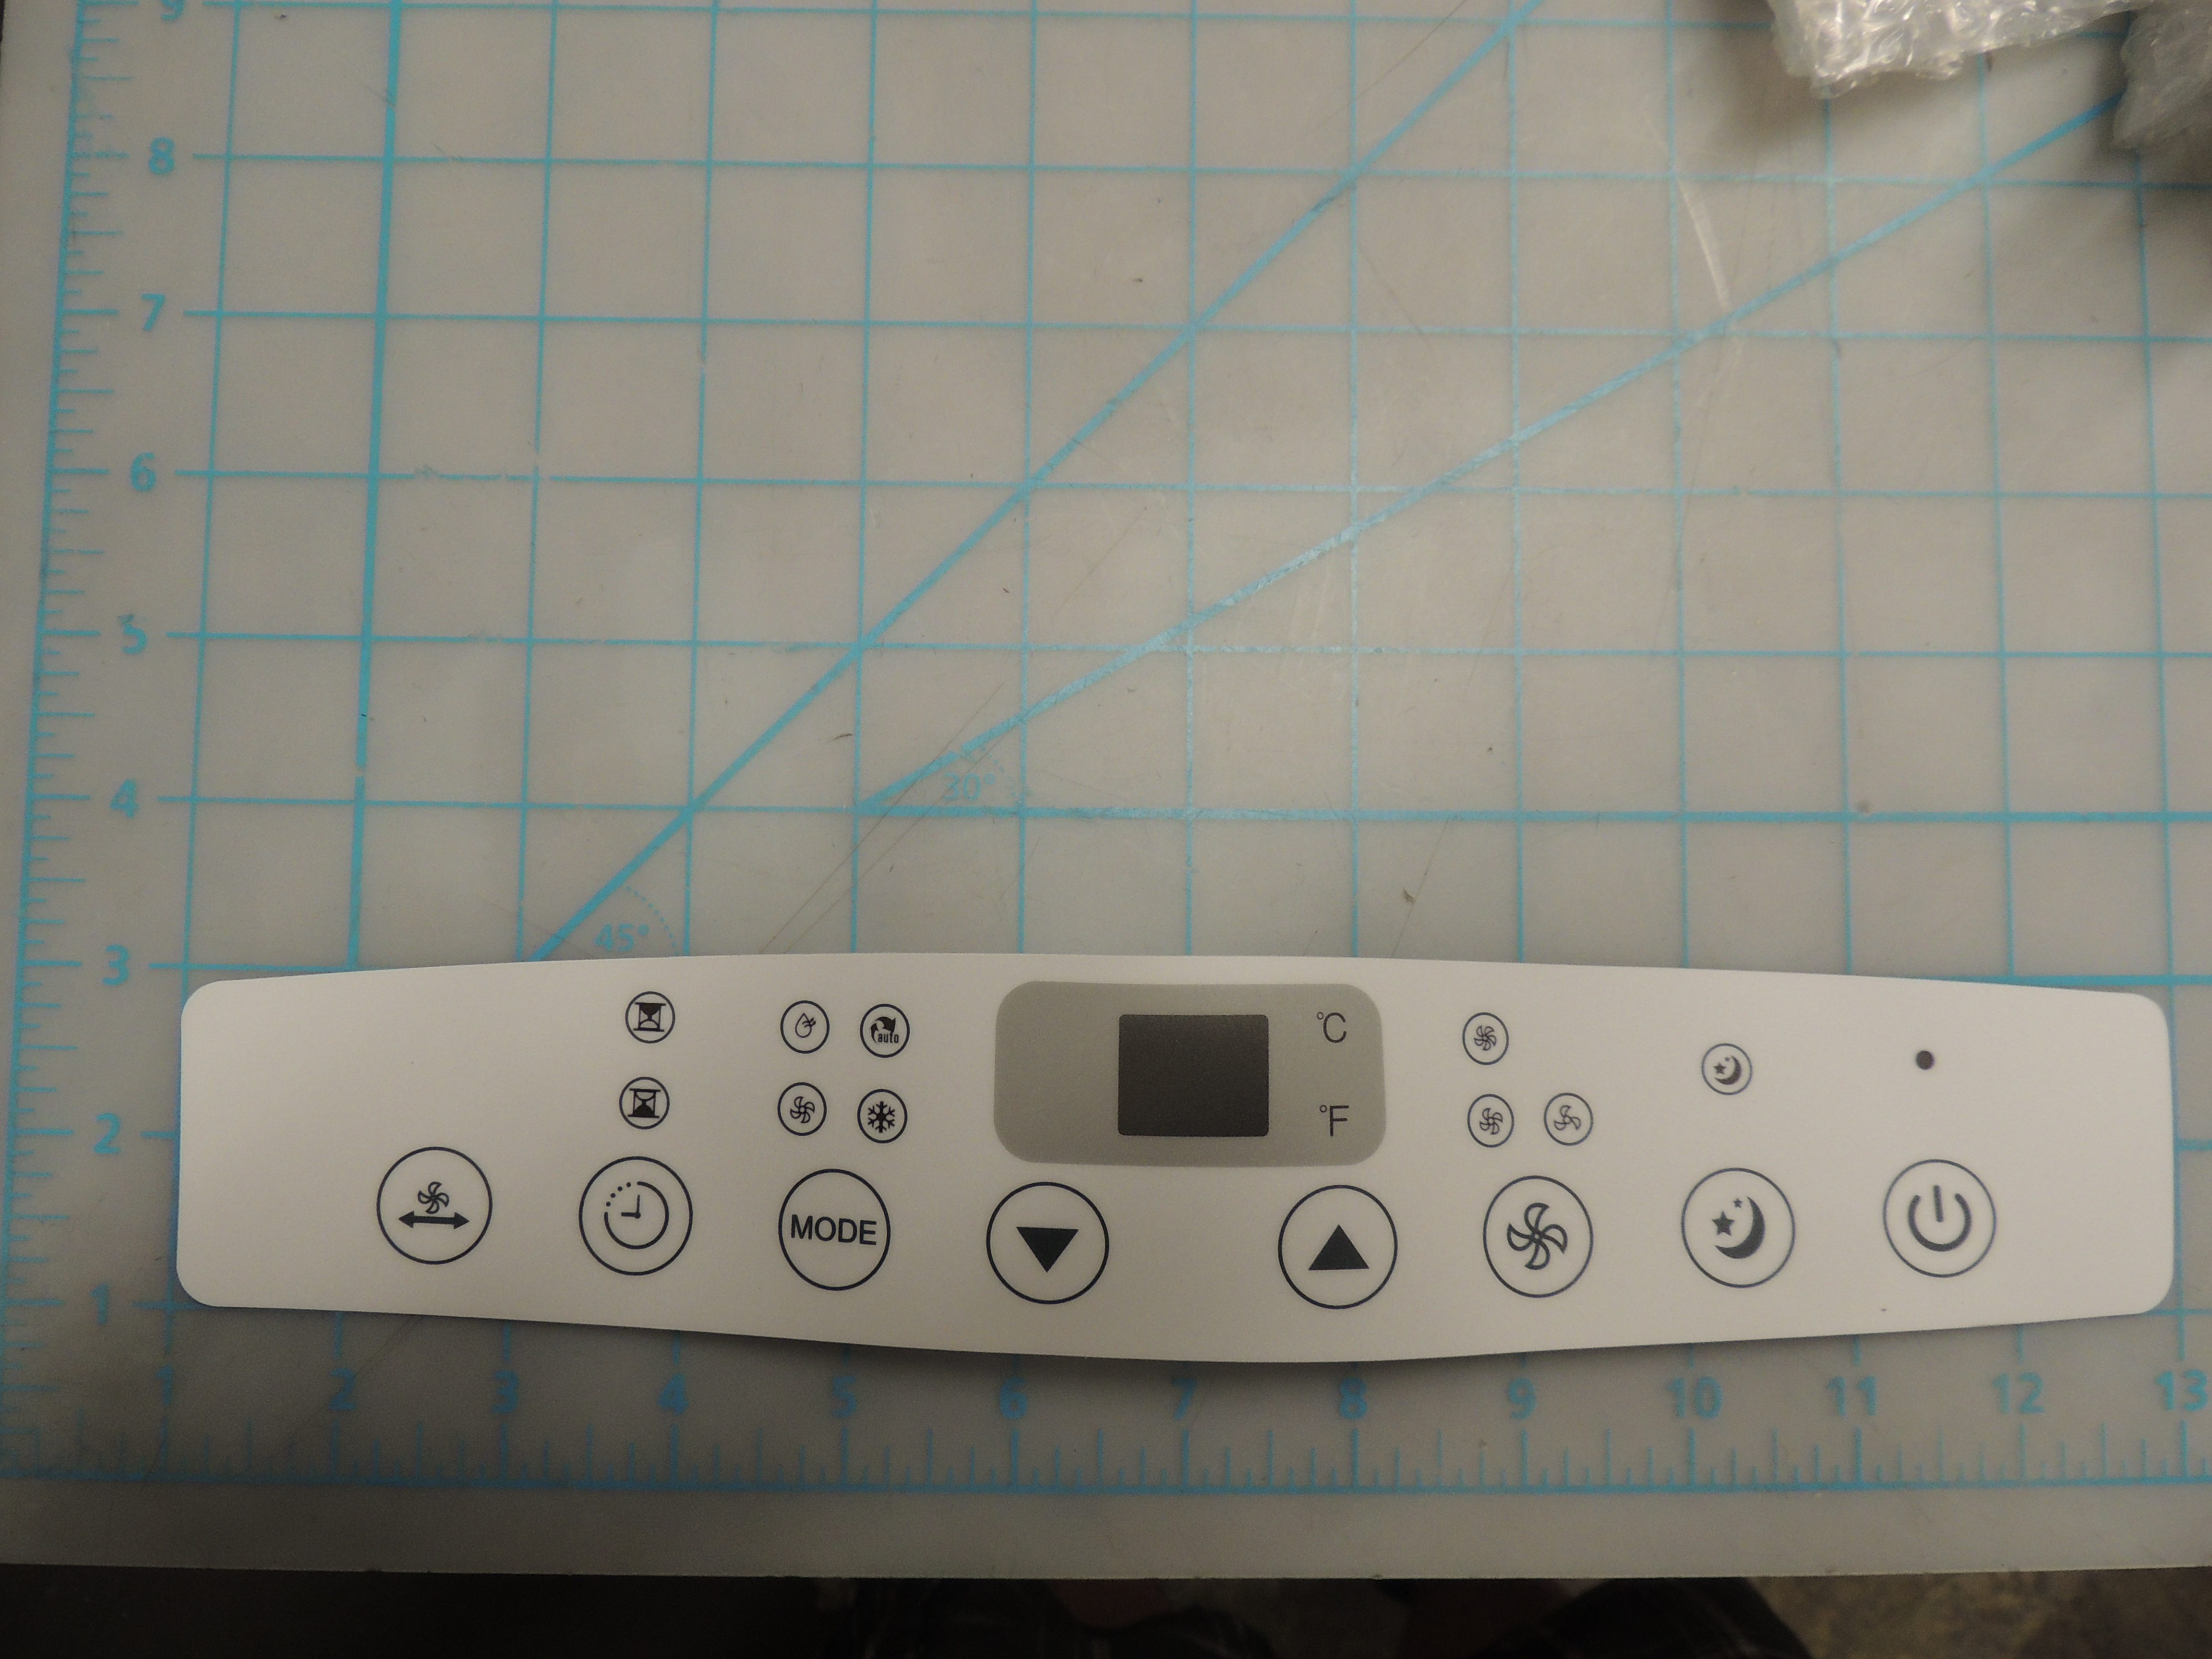 Control panel lebel